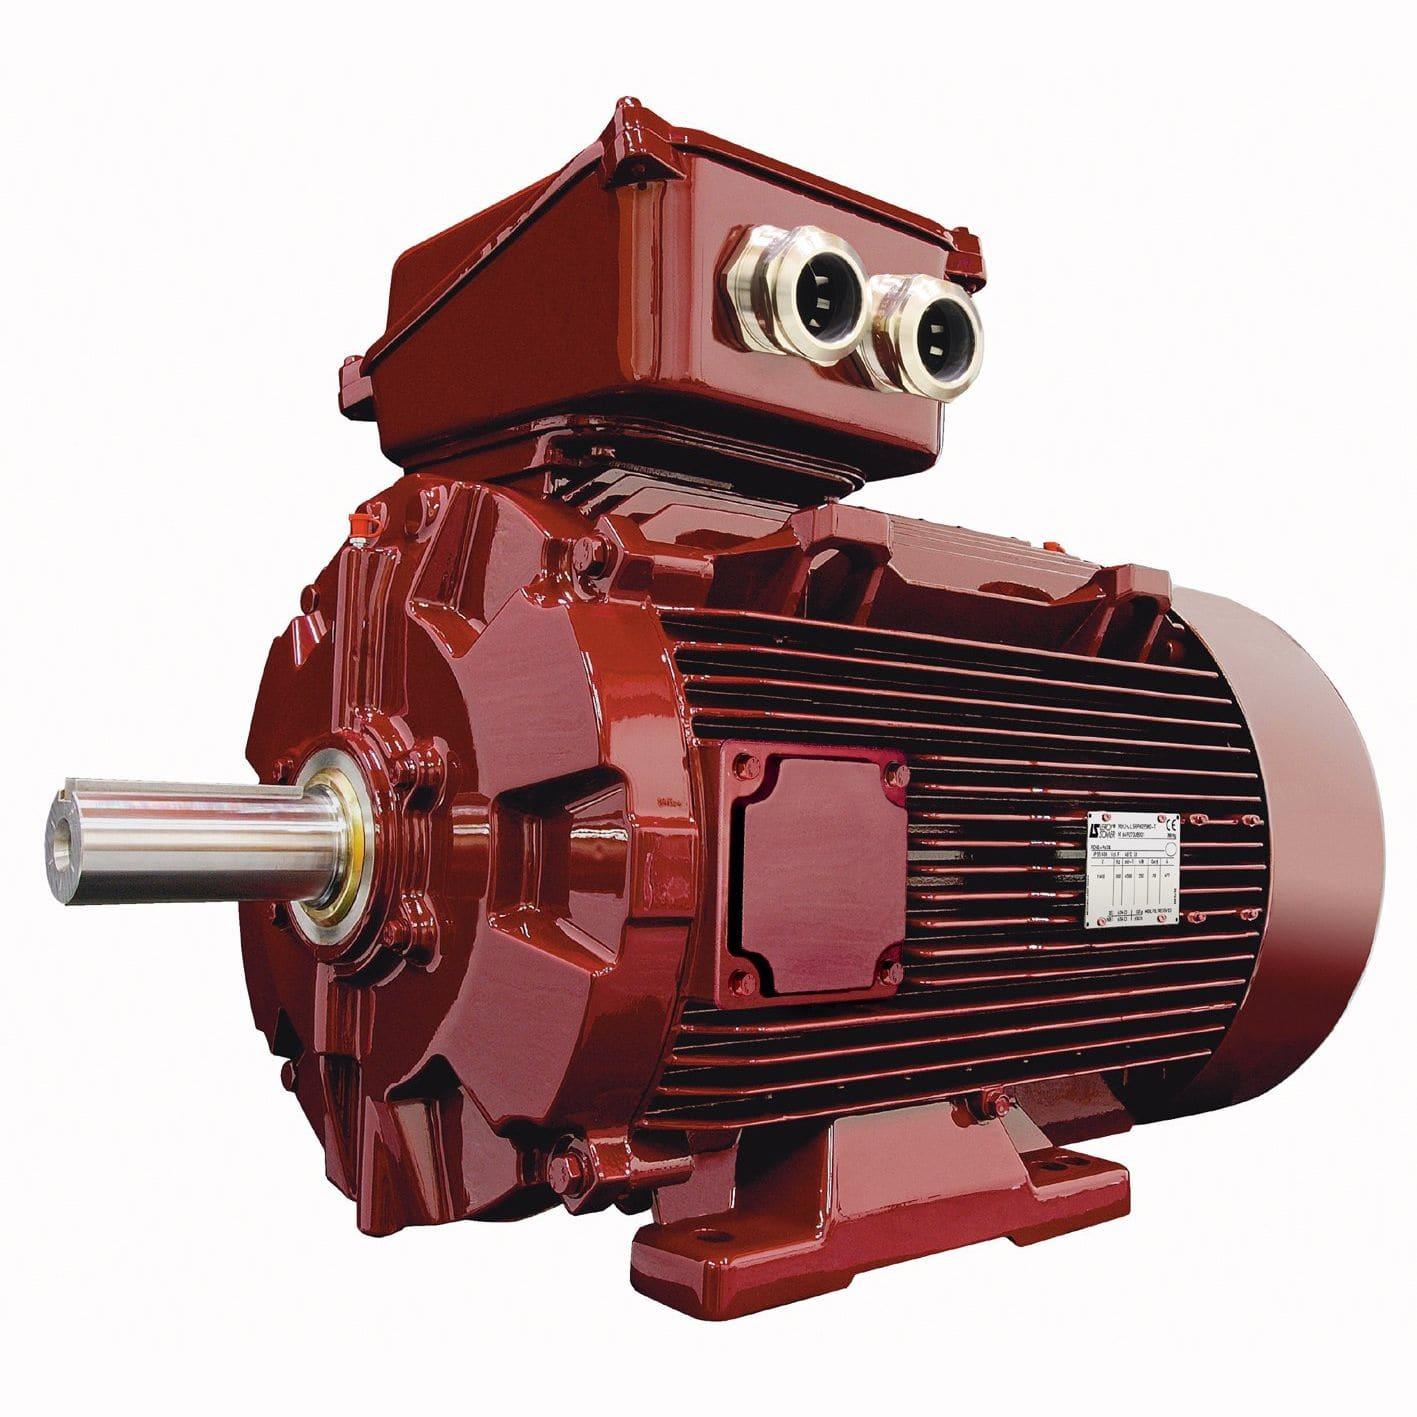 LEROY-SOMER DYNEO 15 HP 20 FLA 460 VOLT PERMANENT MAGNET MOTOR 132 M FRAME